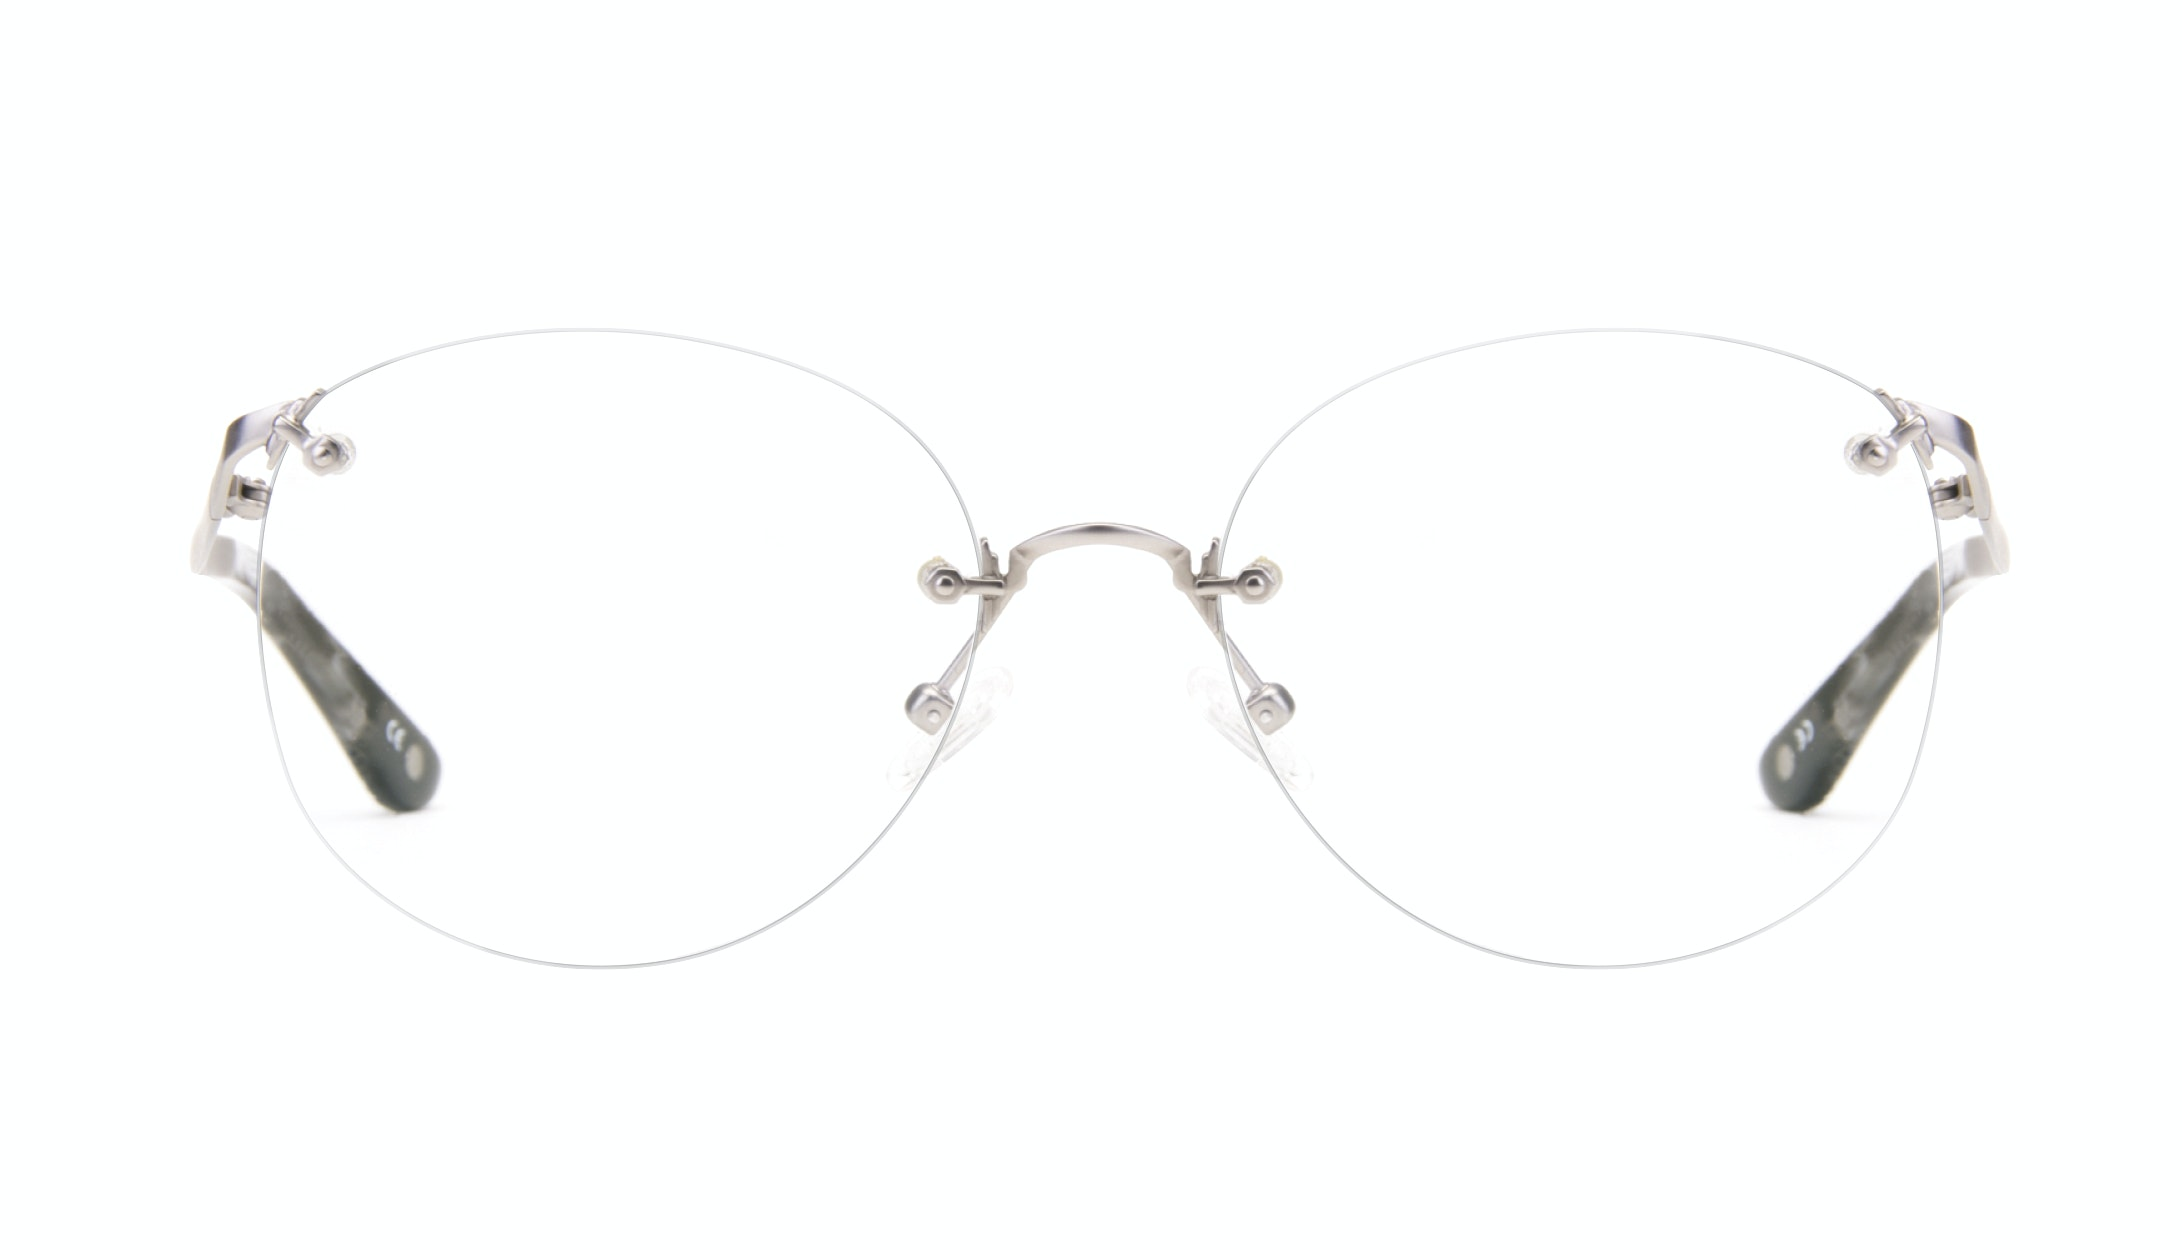 Affordable Fashion Glasses Aviator Eyeglasses Women Anna Steel Front